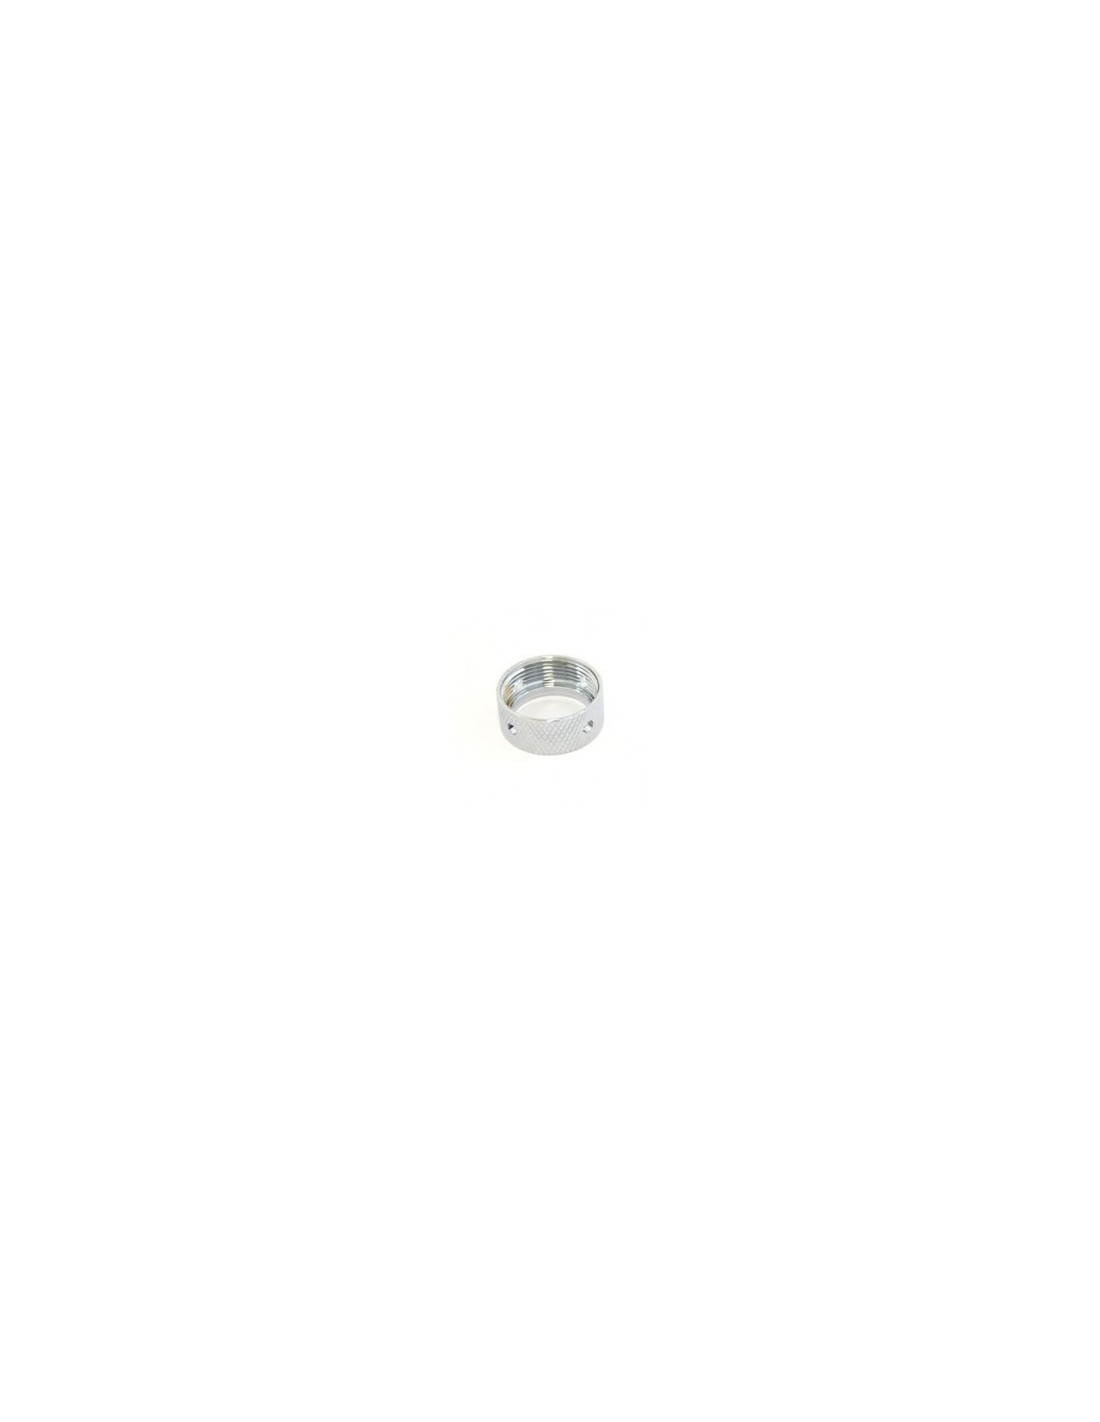 KOH01678 - Räfflad kranmutter i krom (14)